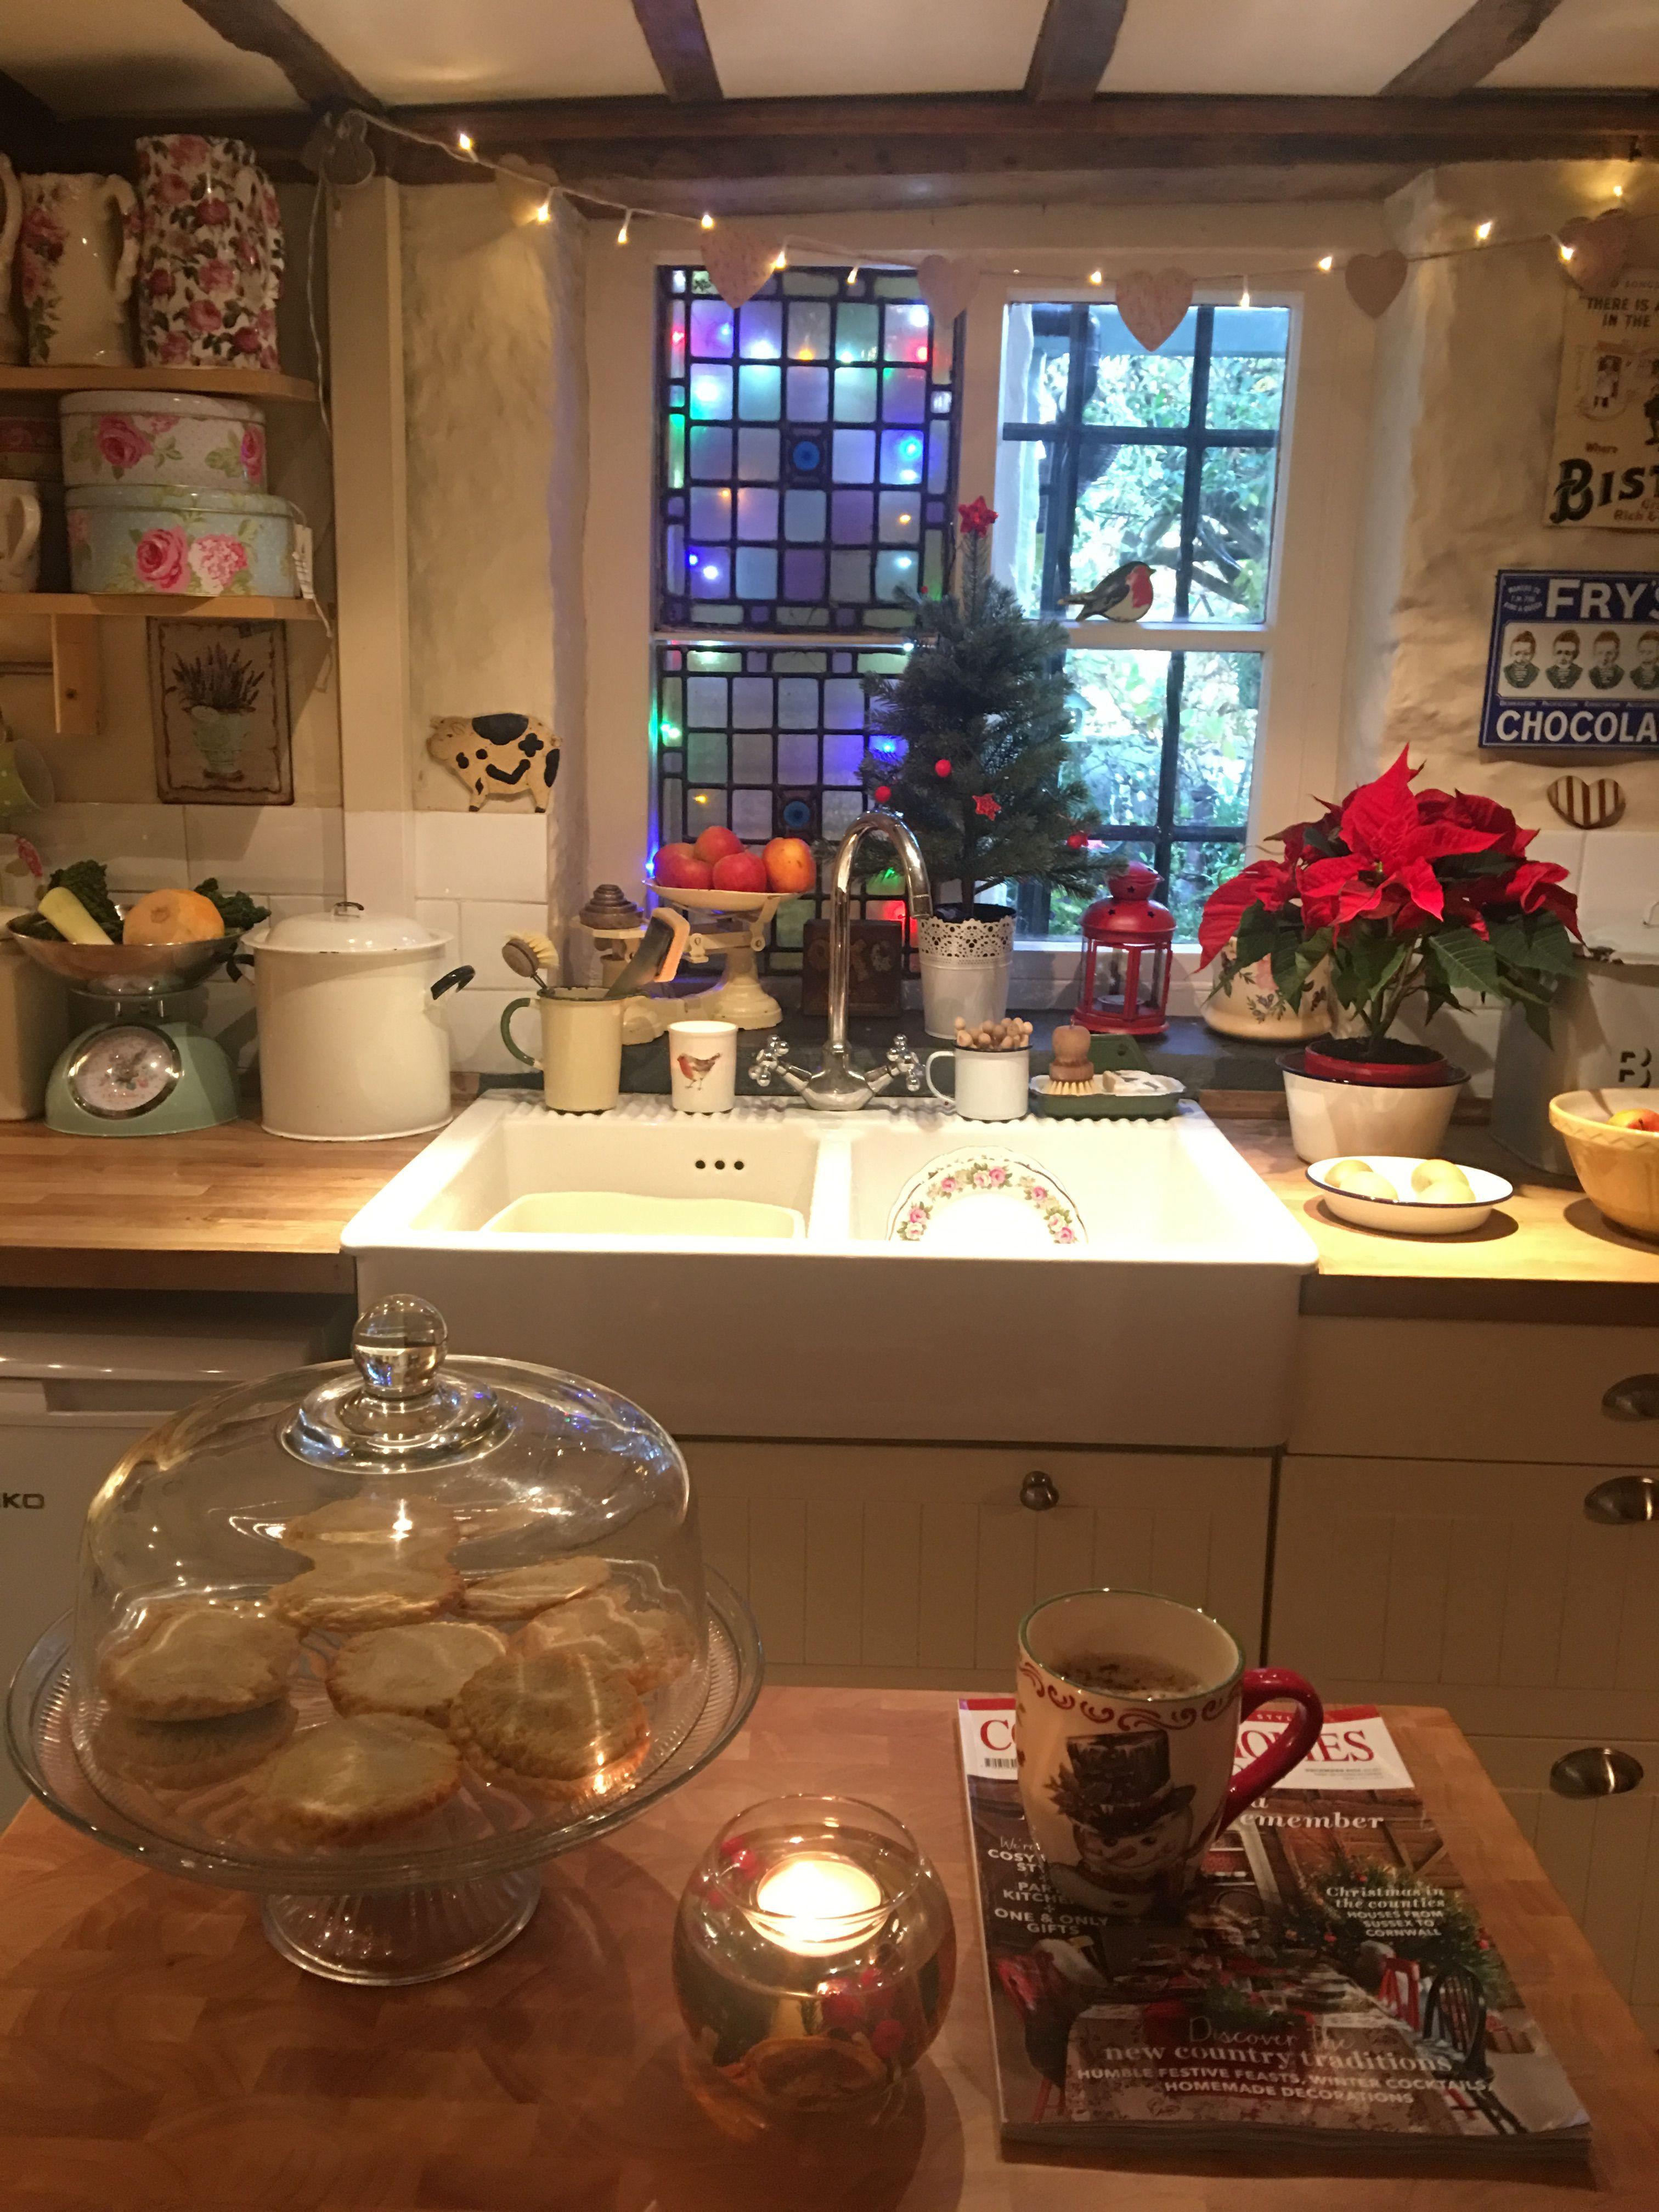 Imaginecozy Staging A Kitchen: Pin By Daniela Garcia On Lol In 2019